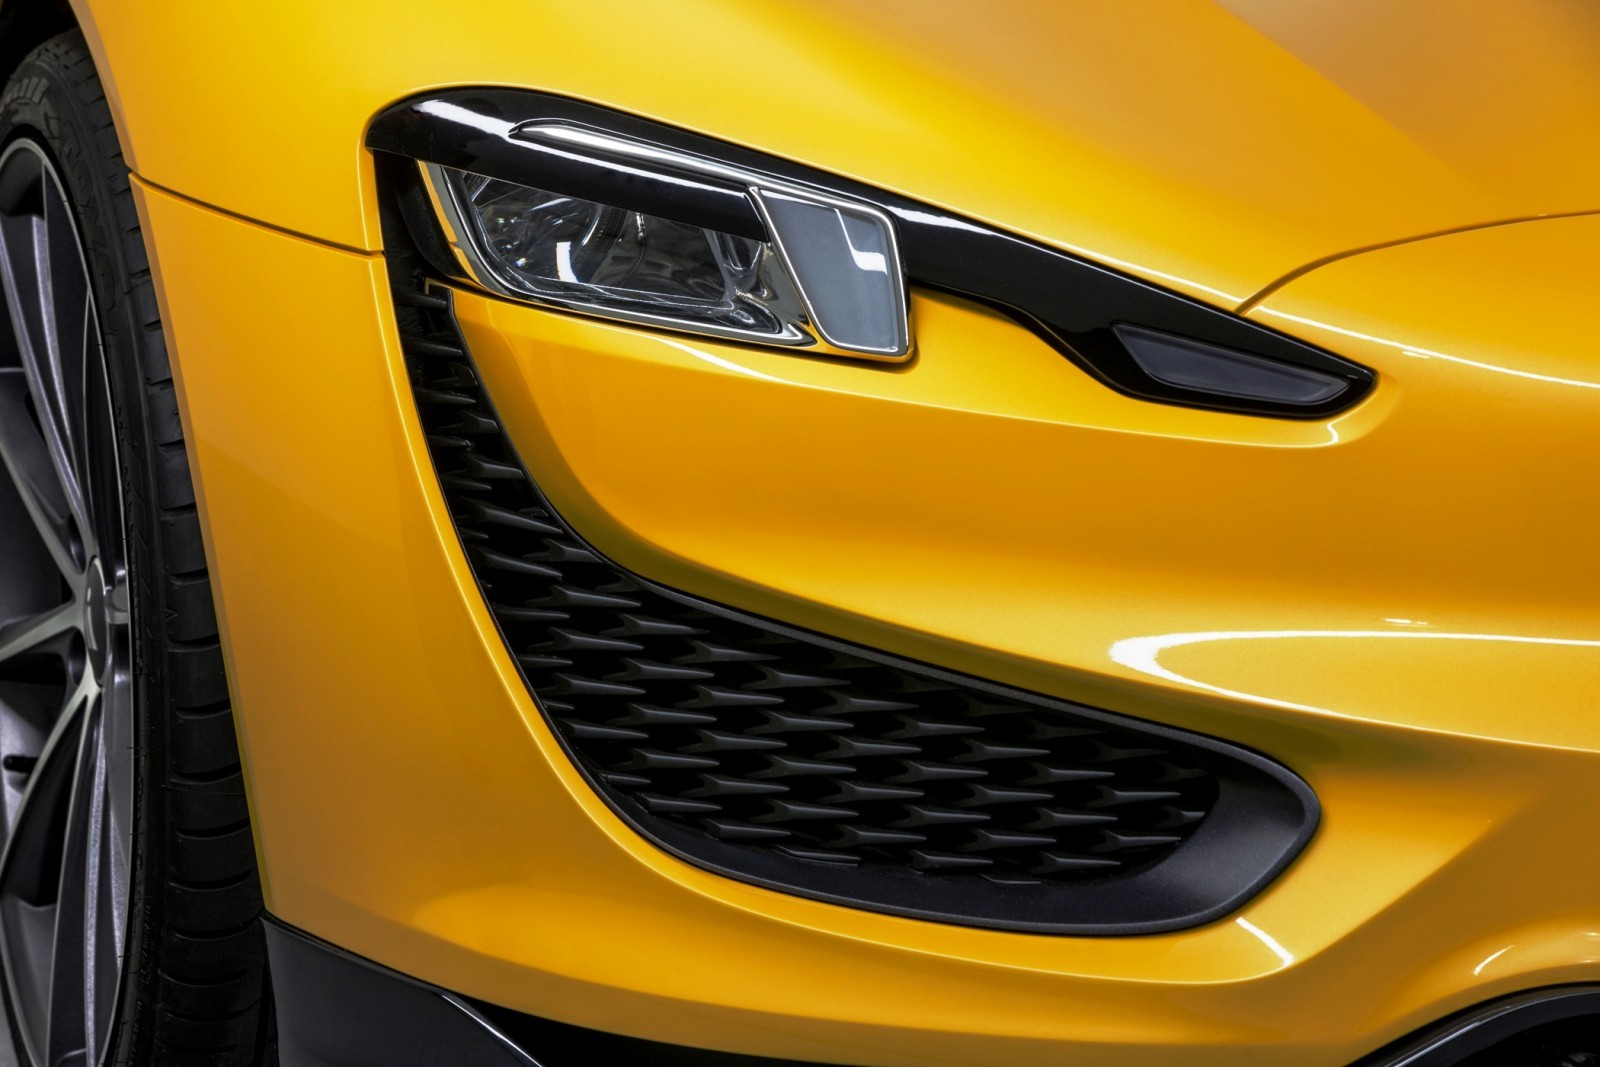 2015 Magna Steyr MILA Plus 11